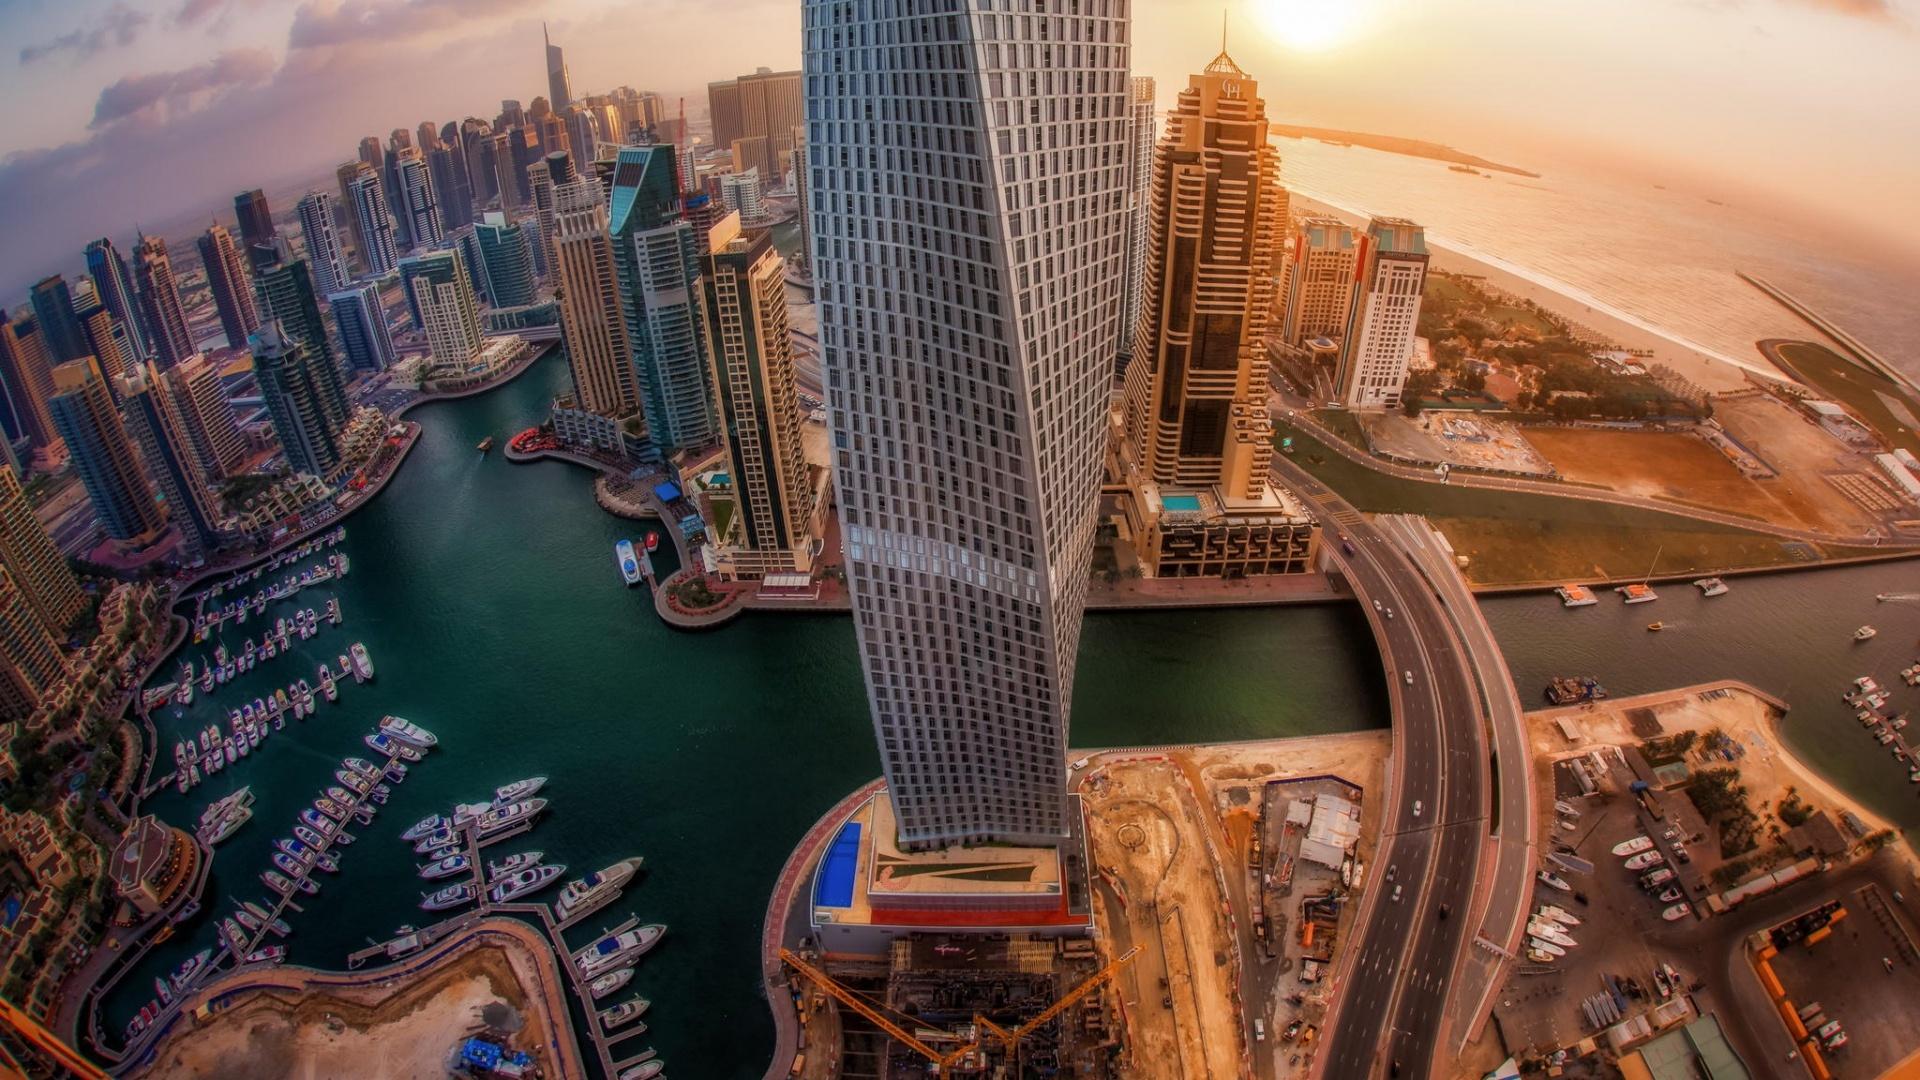 Dubai free download wallpaper